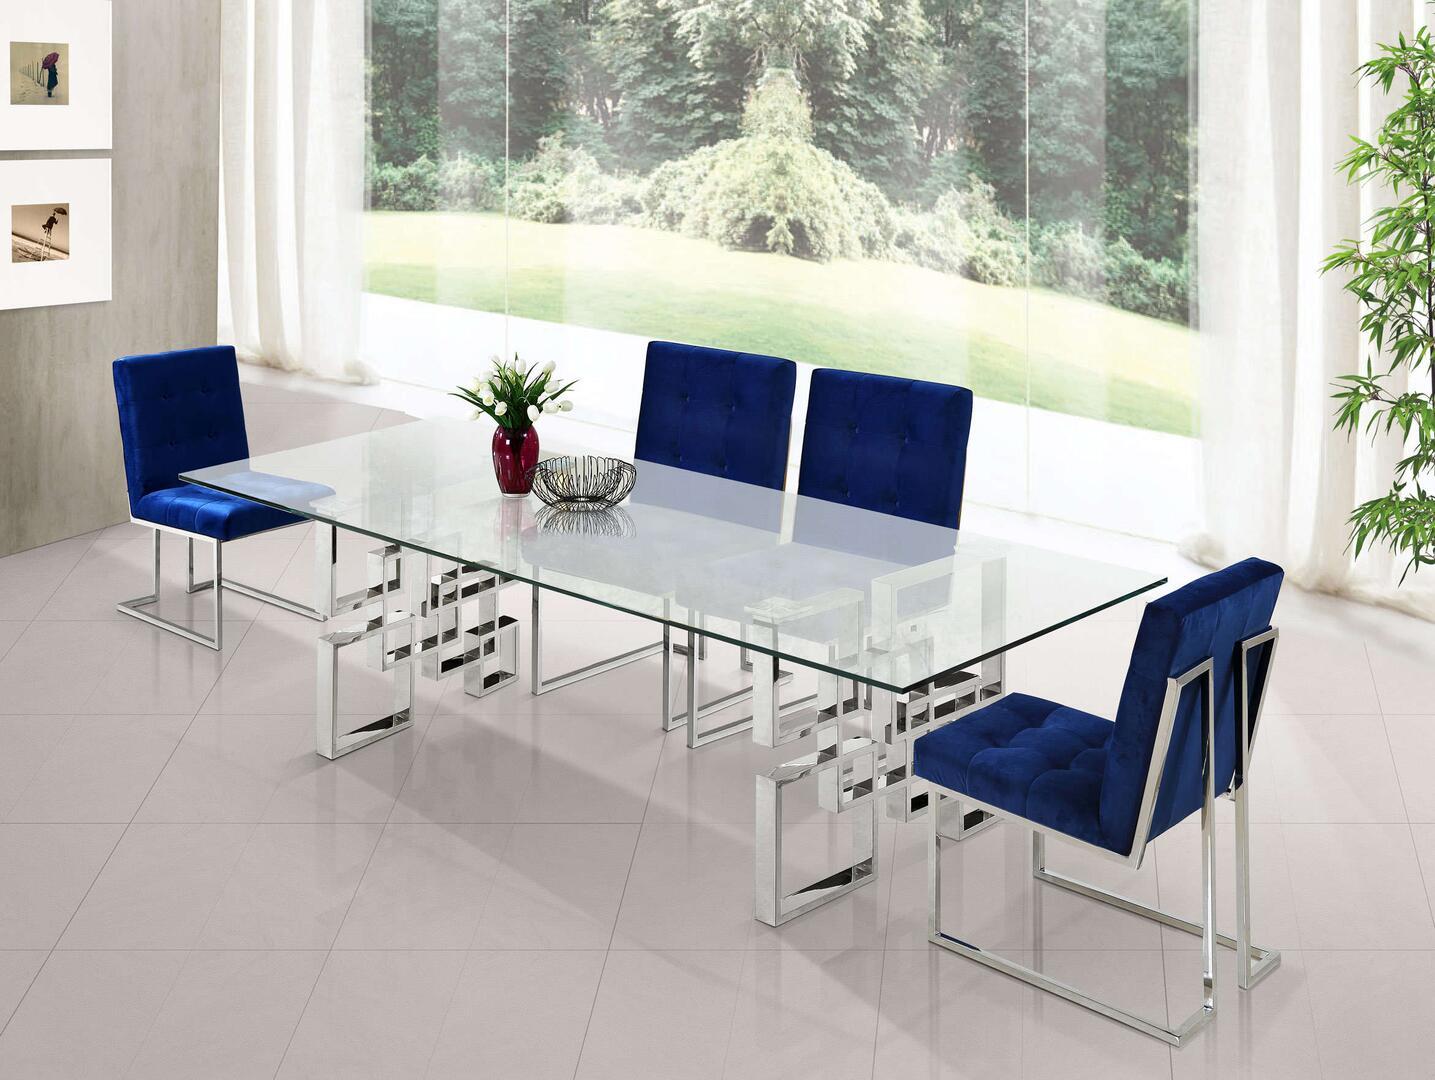 Enjoyable Meridian Mer5Pcrecdh4Blukit2 Andrewgaddart Wooden Chair Designs For Living Room Andrewgaddartcom